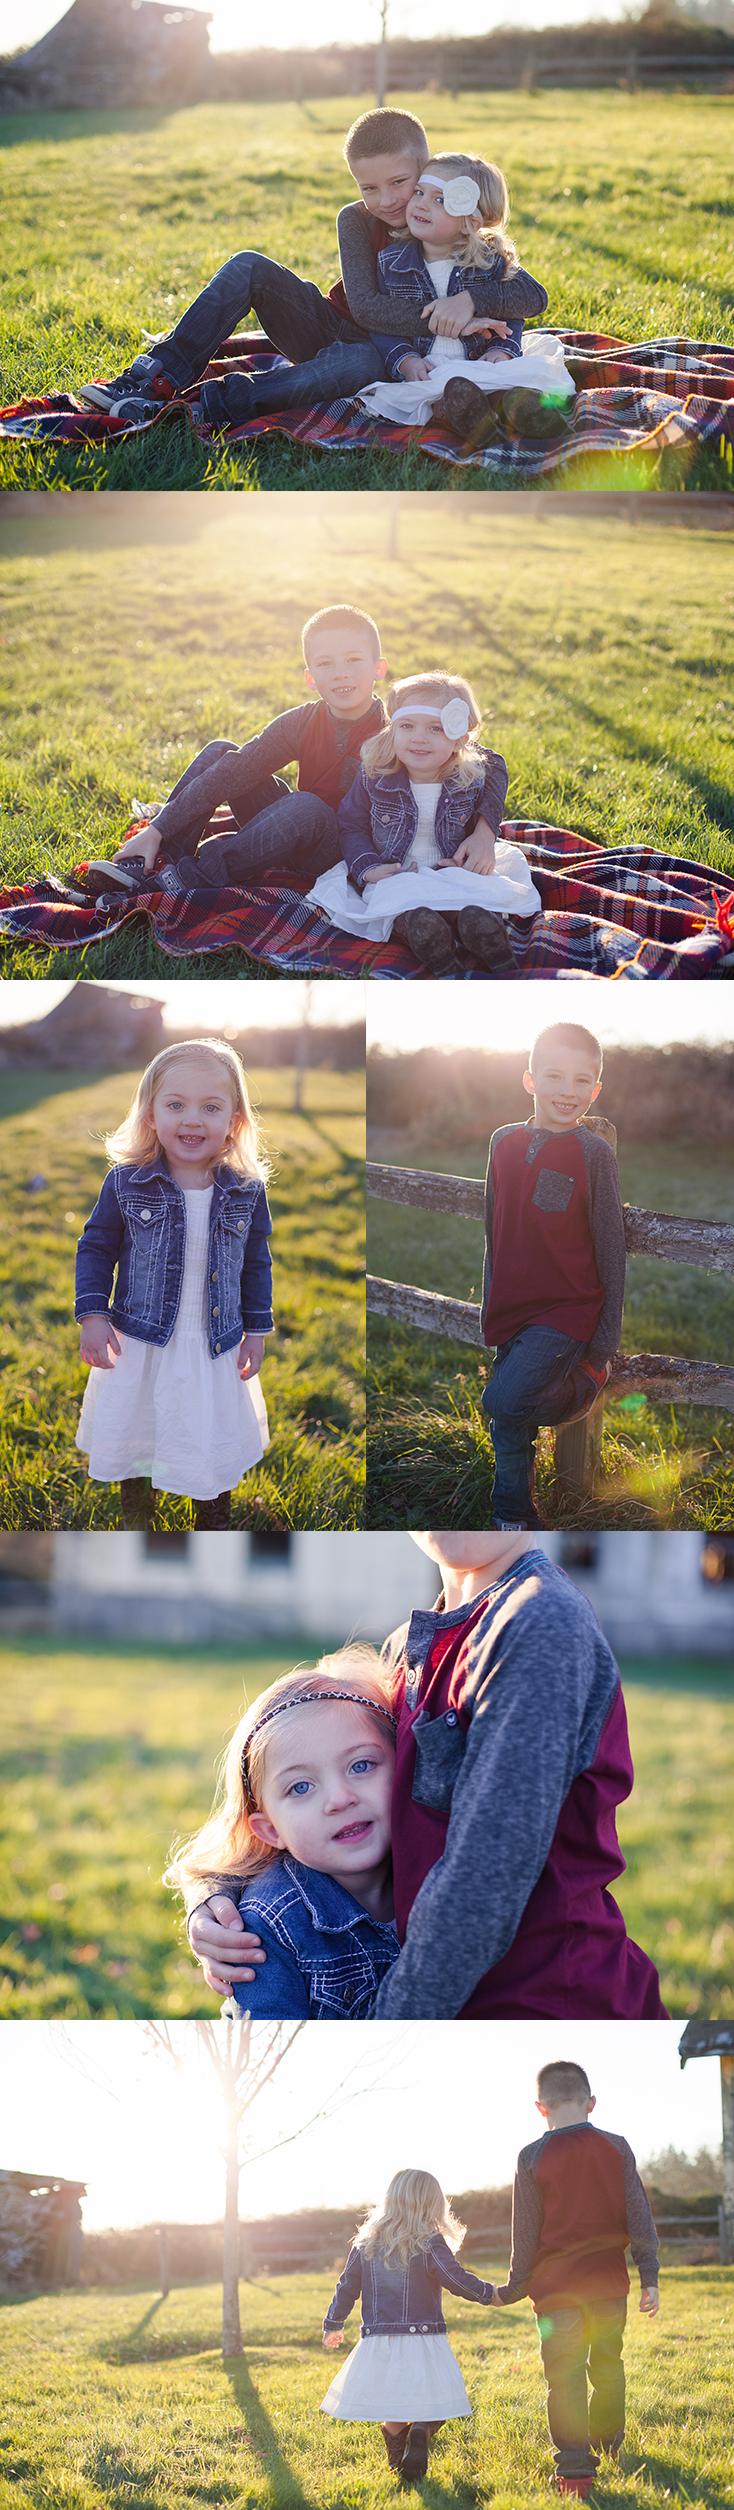 bellinghamfamilyphotographer1